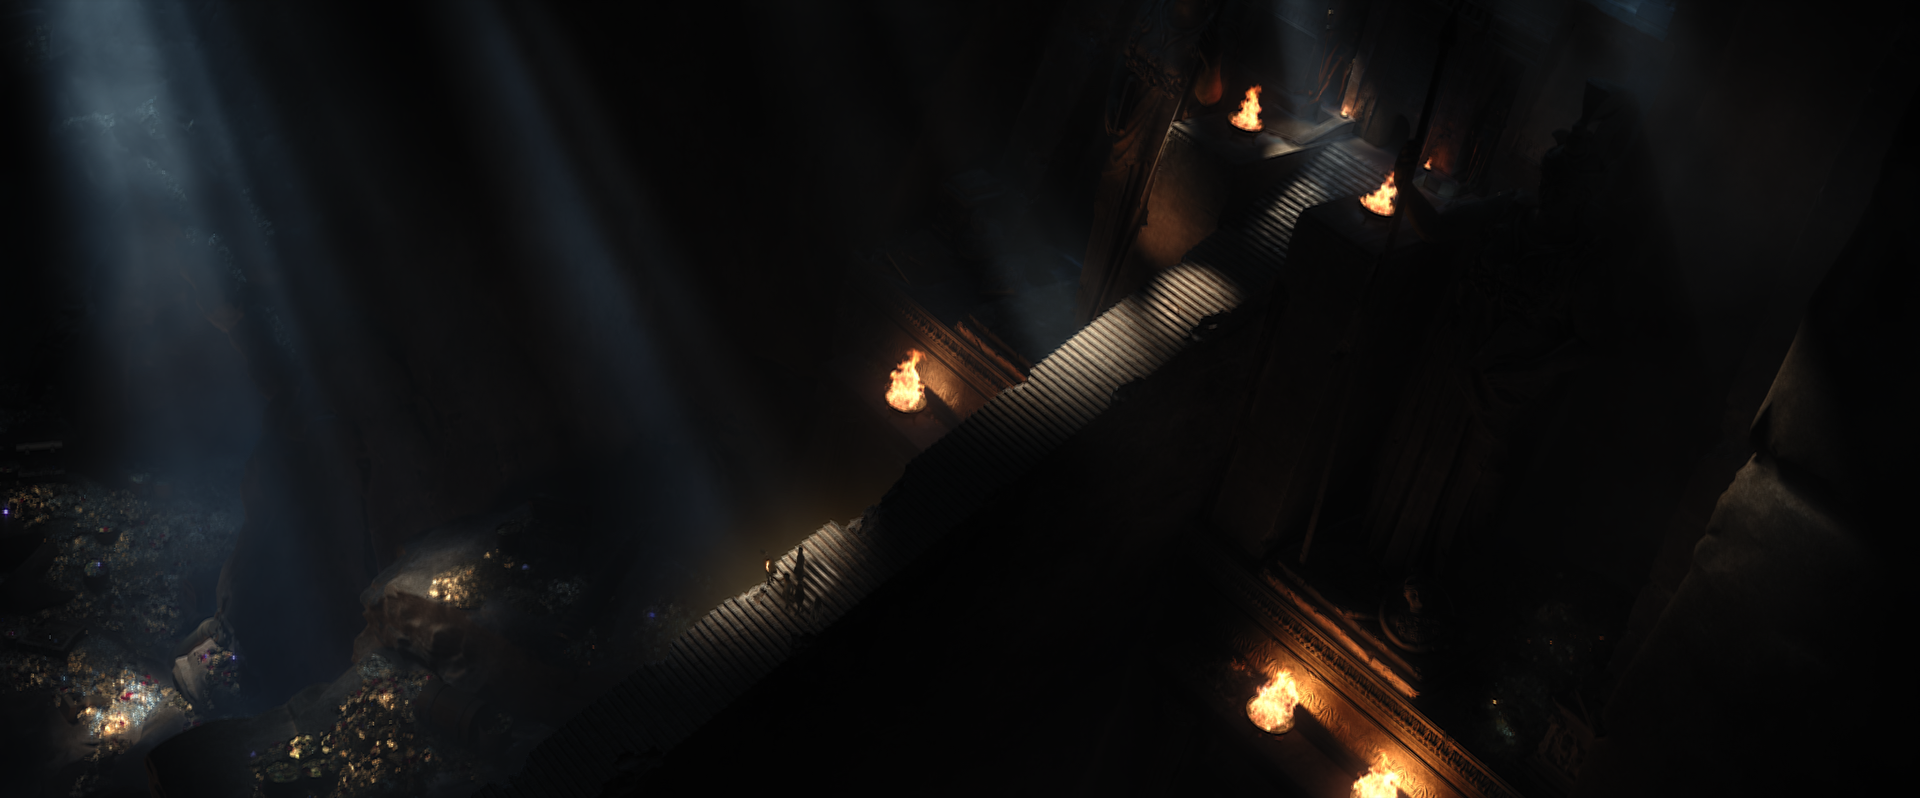 Baghdad Thief | VFX Breakdown